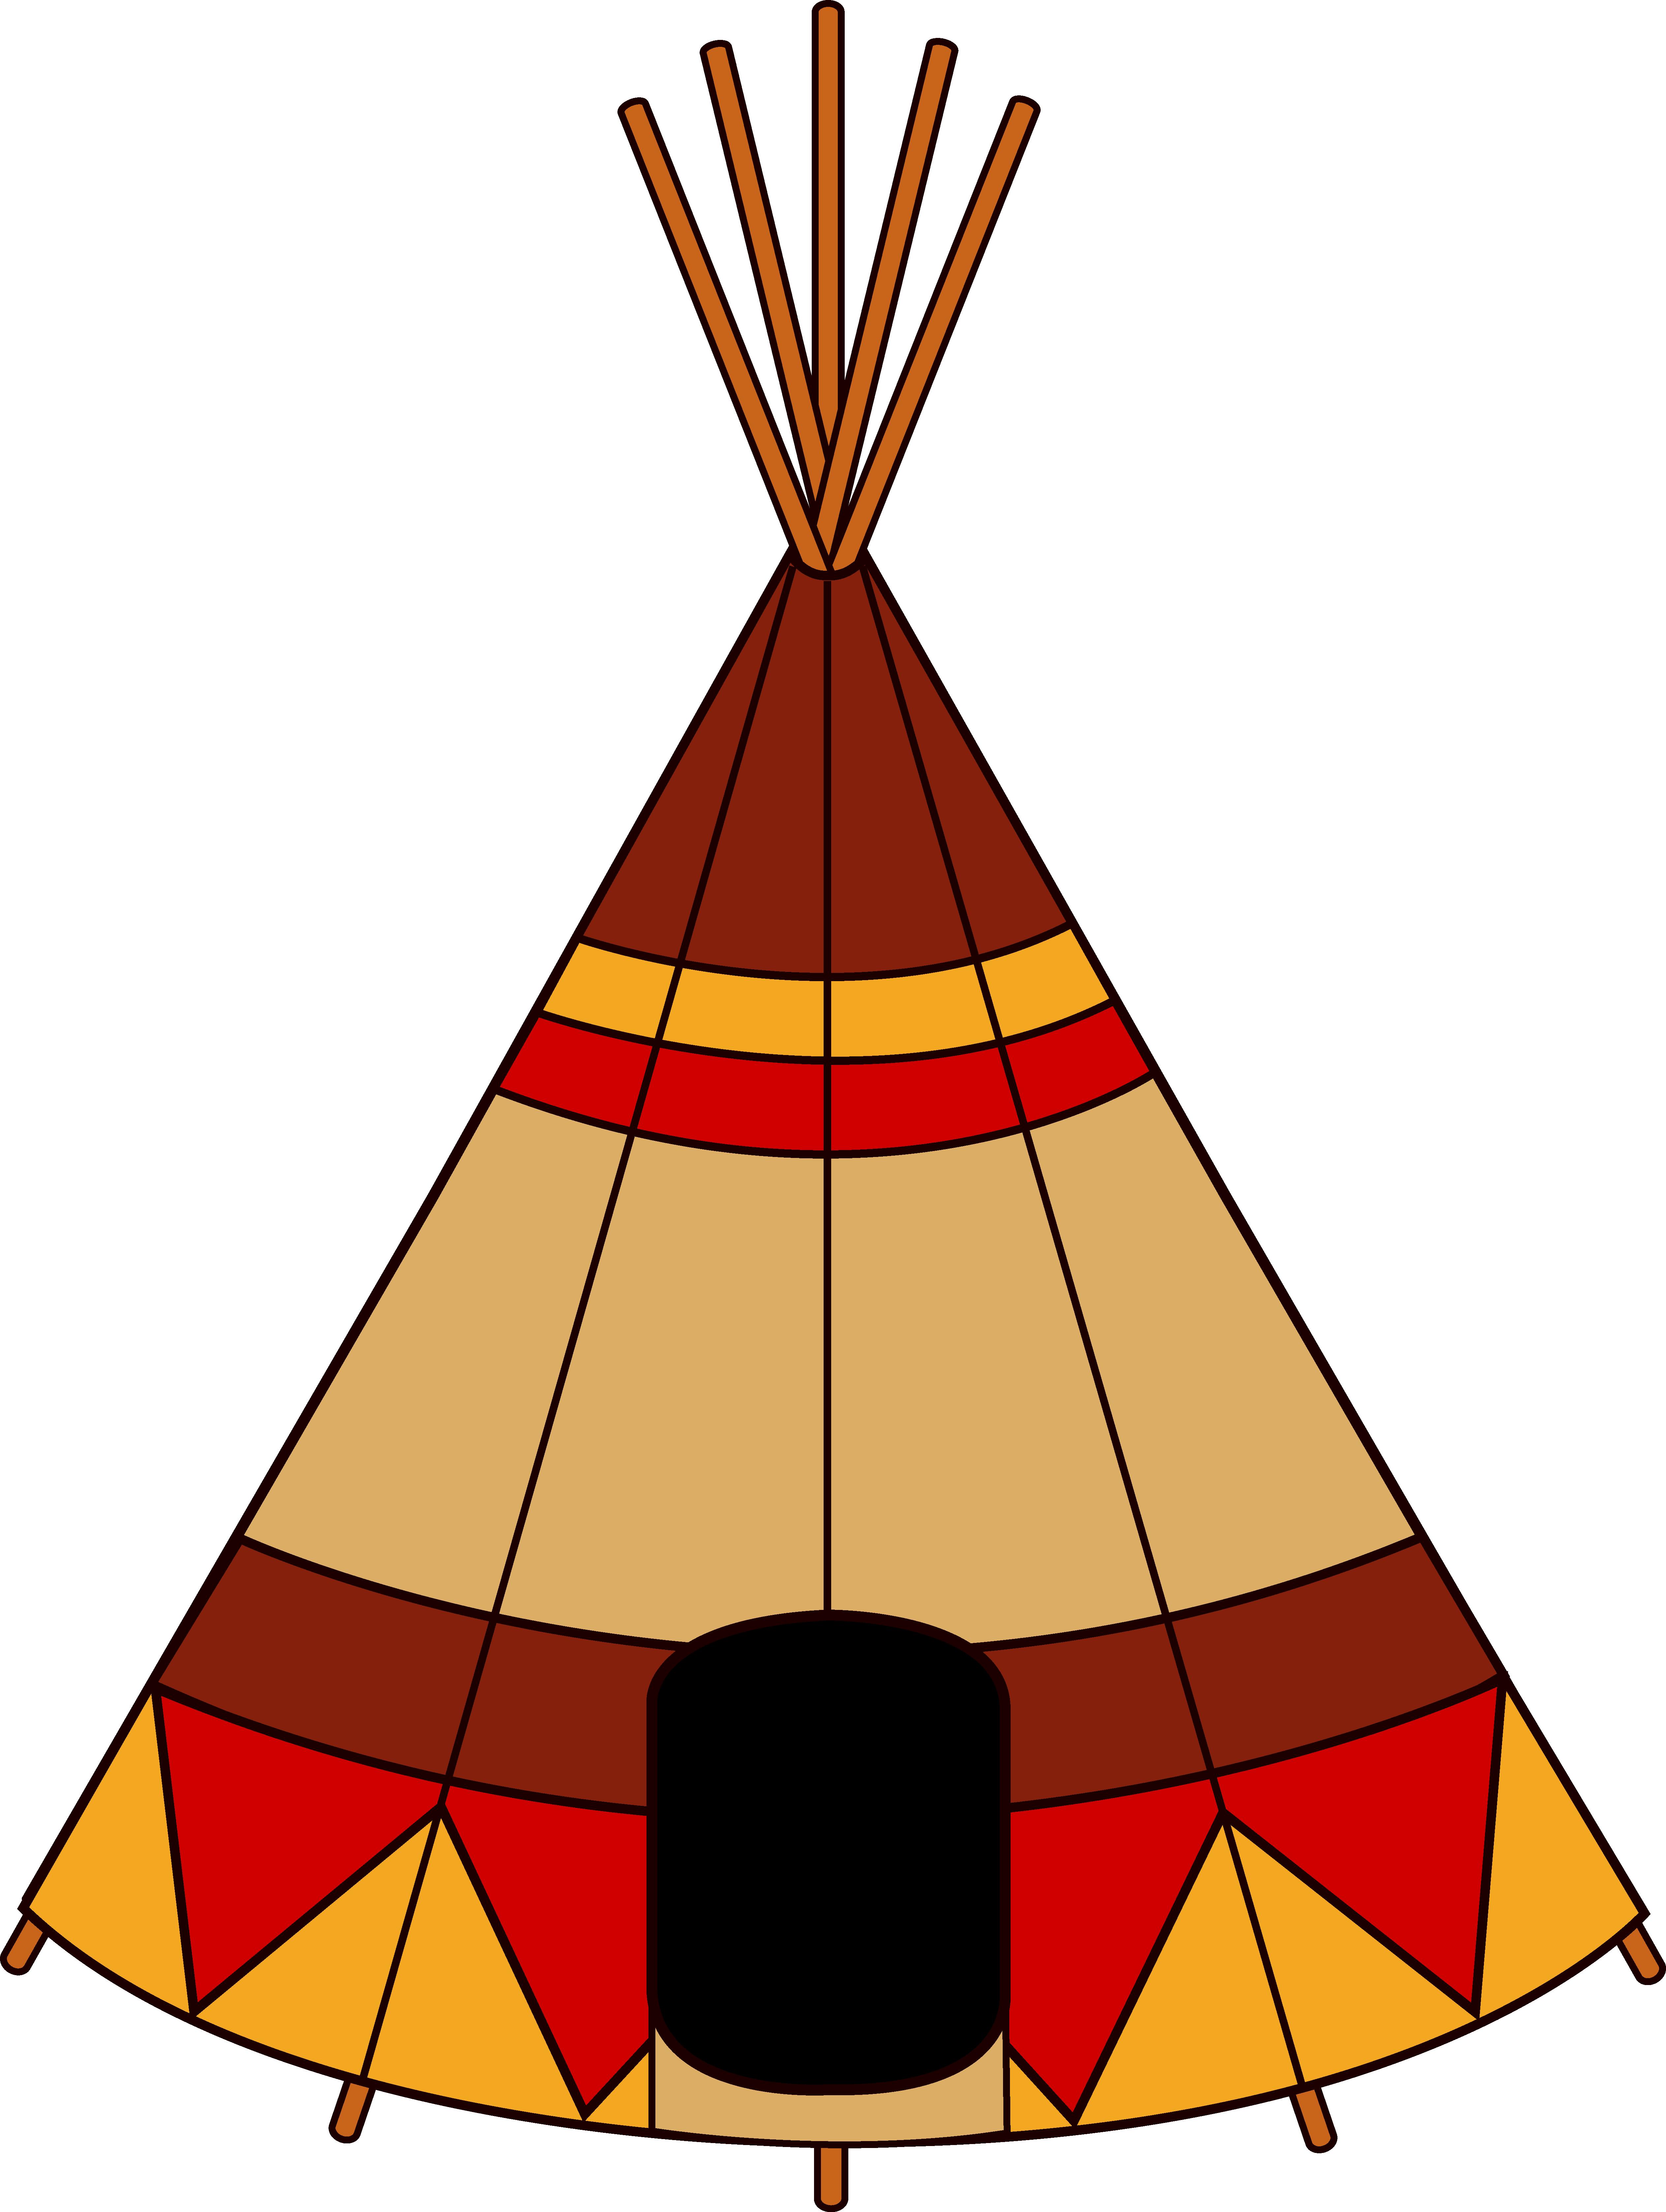 Native American Teepee - Free Clip Art-Native American Teepee - Free Clip Art-15